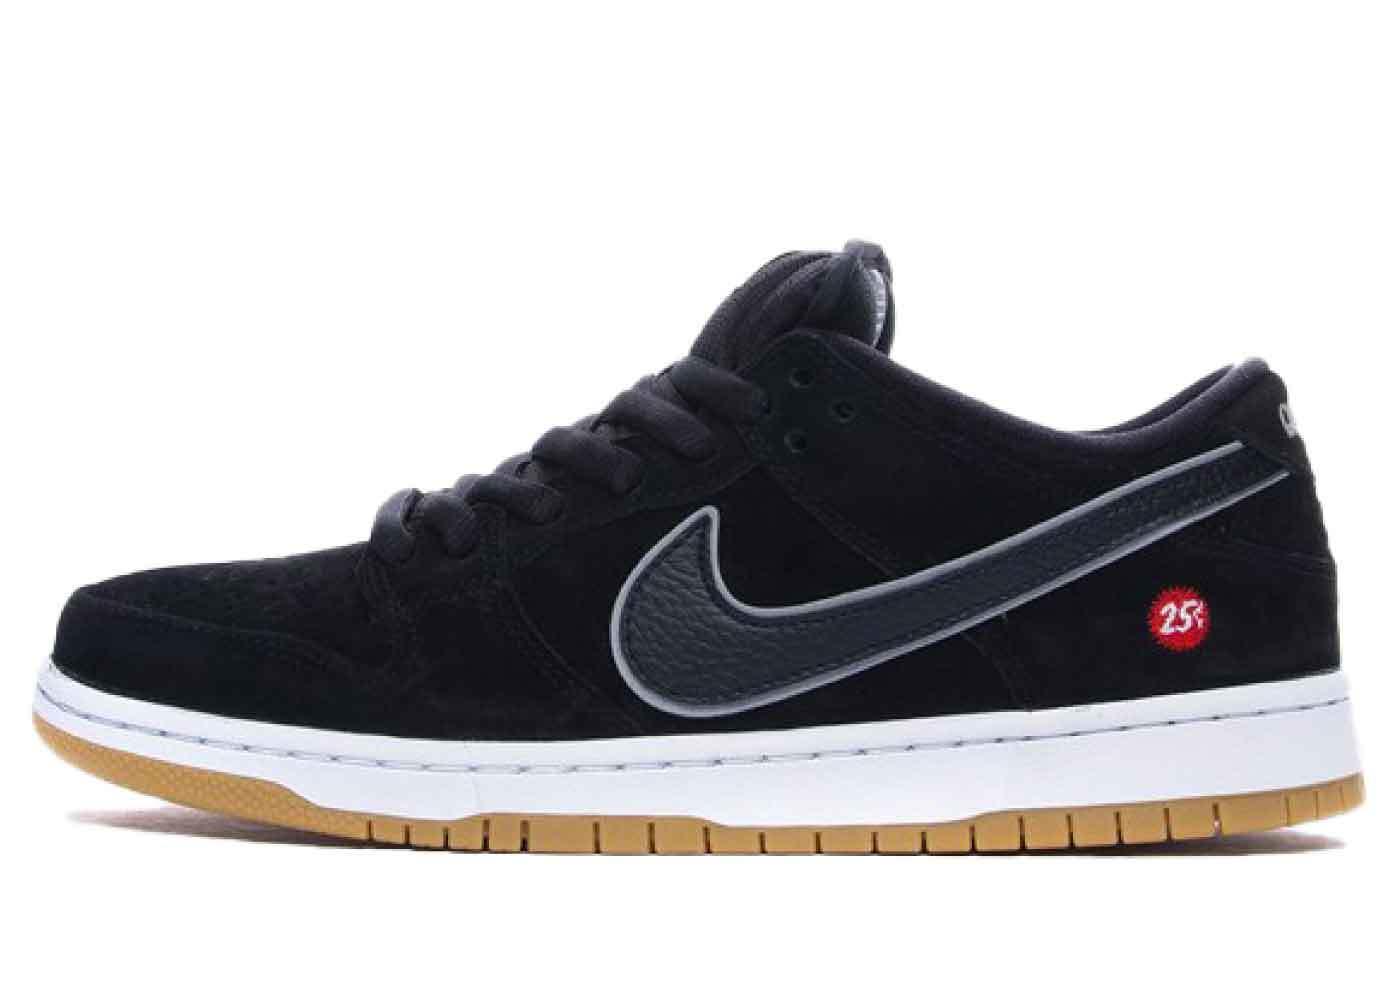 Nike SB Dunk Low Quartersnacksの写真